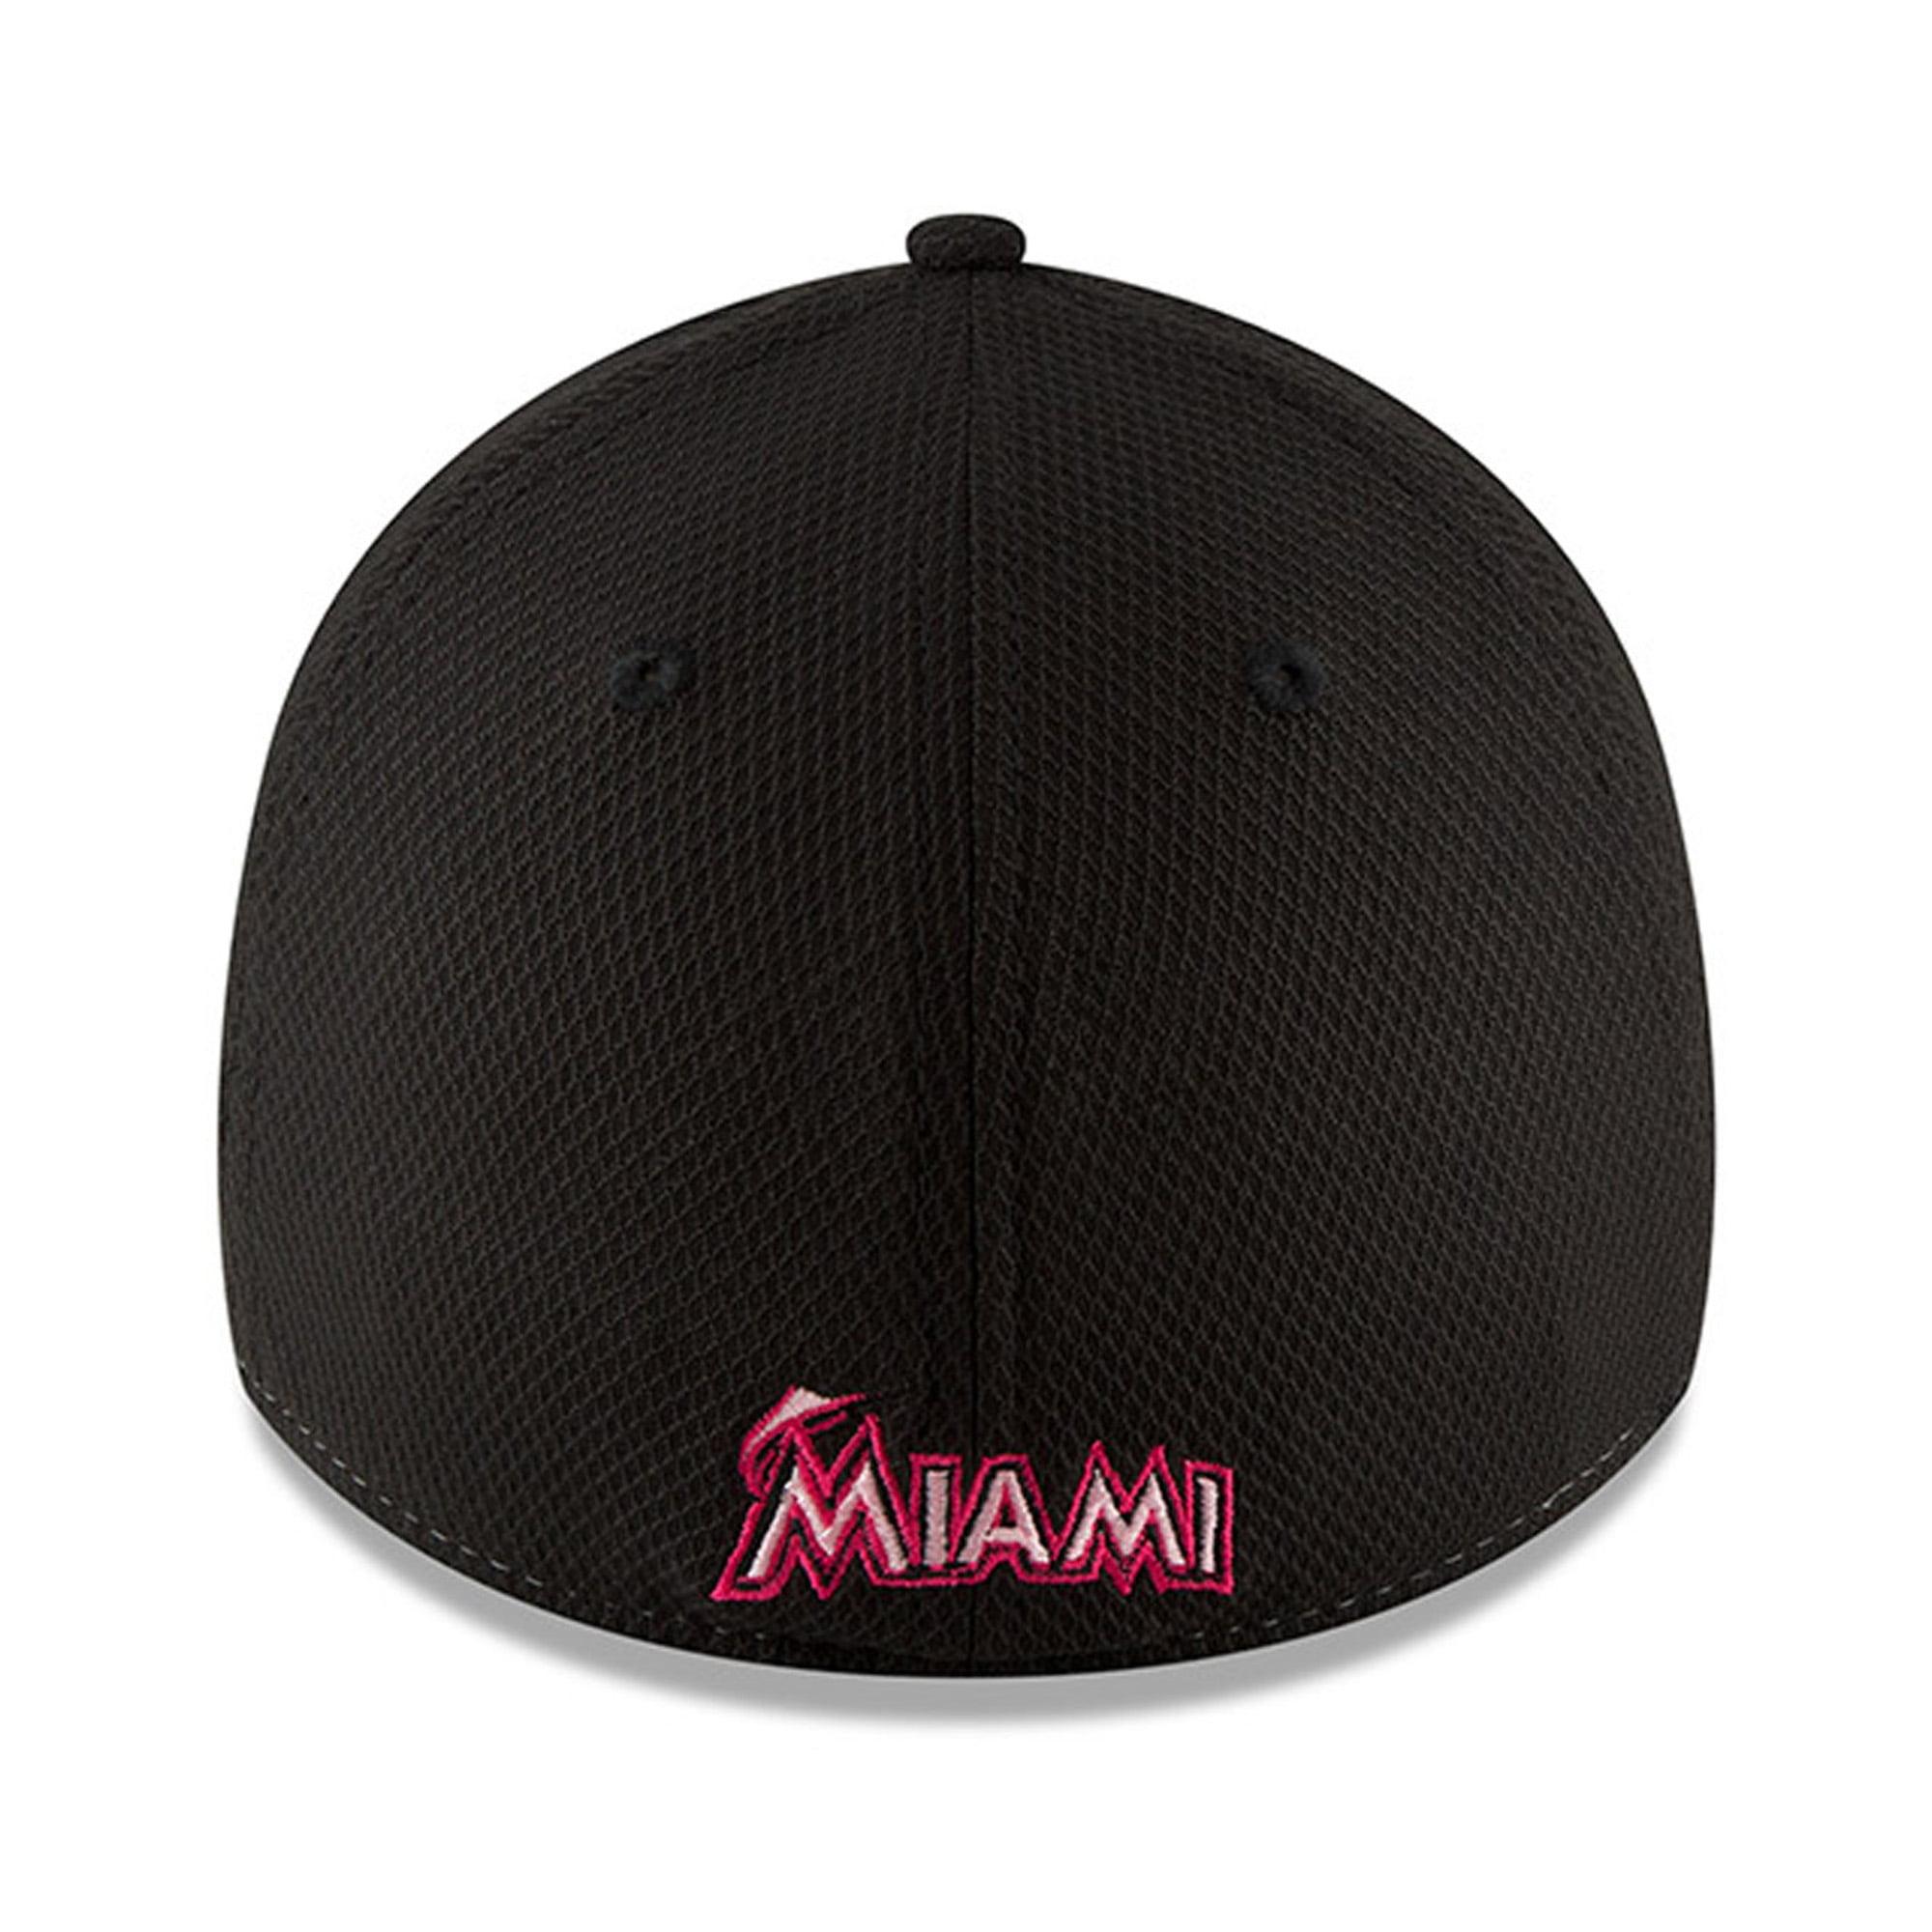 new style 54d4d fe883 Miami Marlins New Era 2018 Mother s Day 39THIRTY Flex Hat - Pink -  Walmart.com